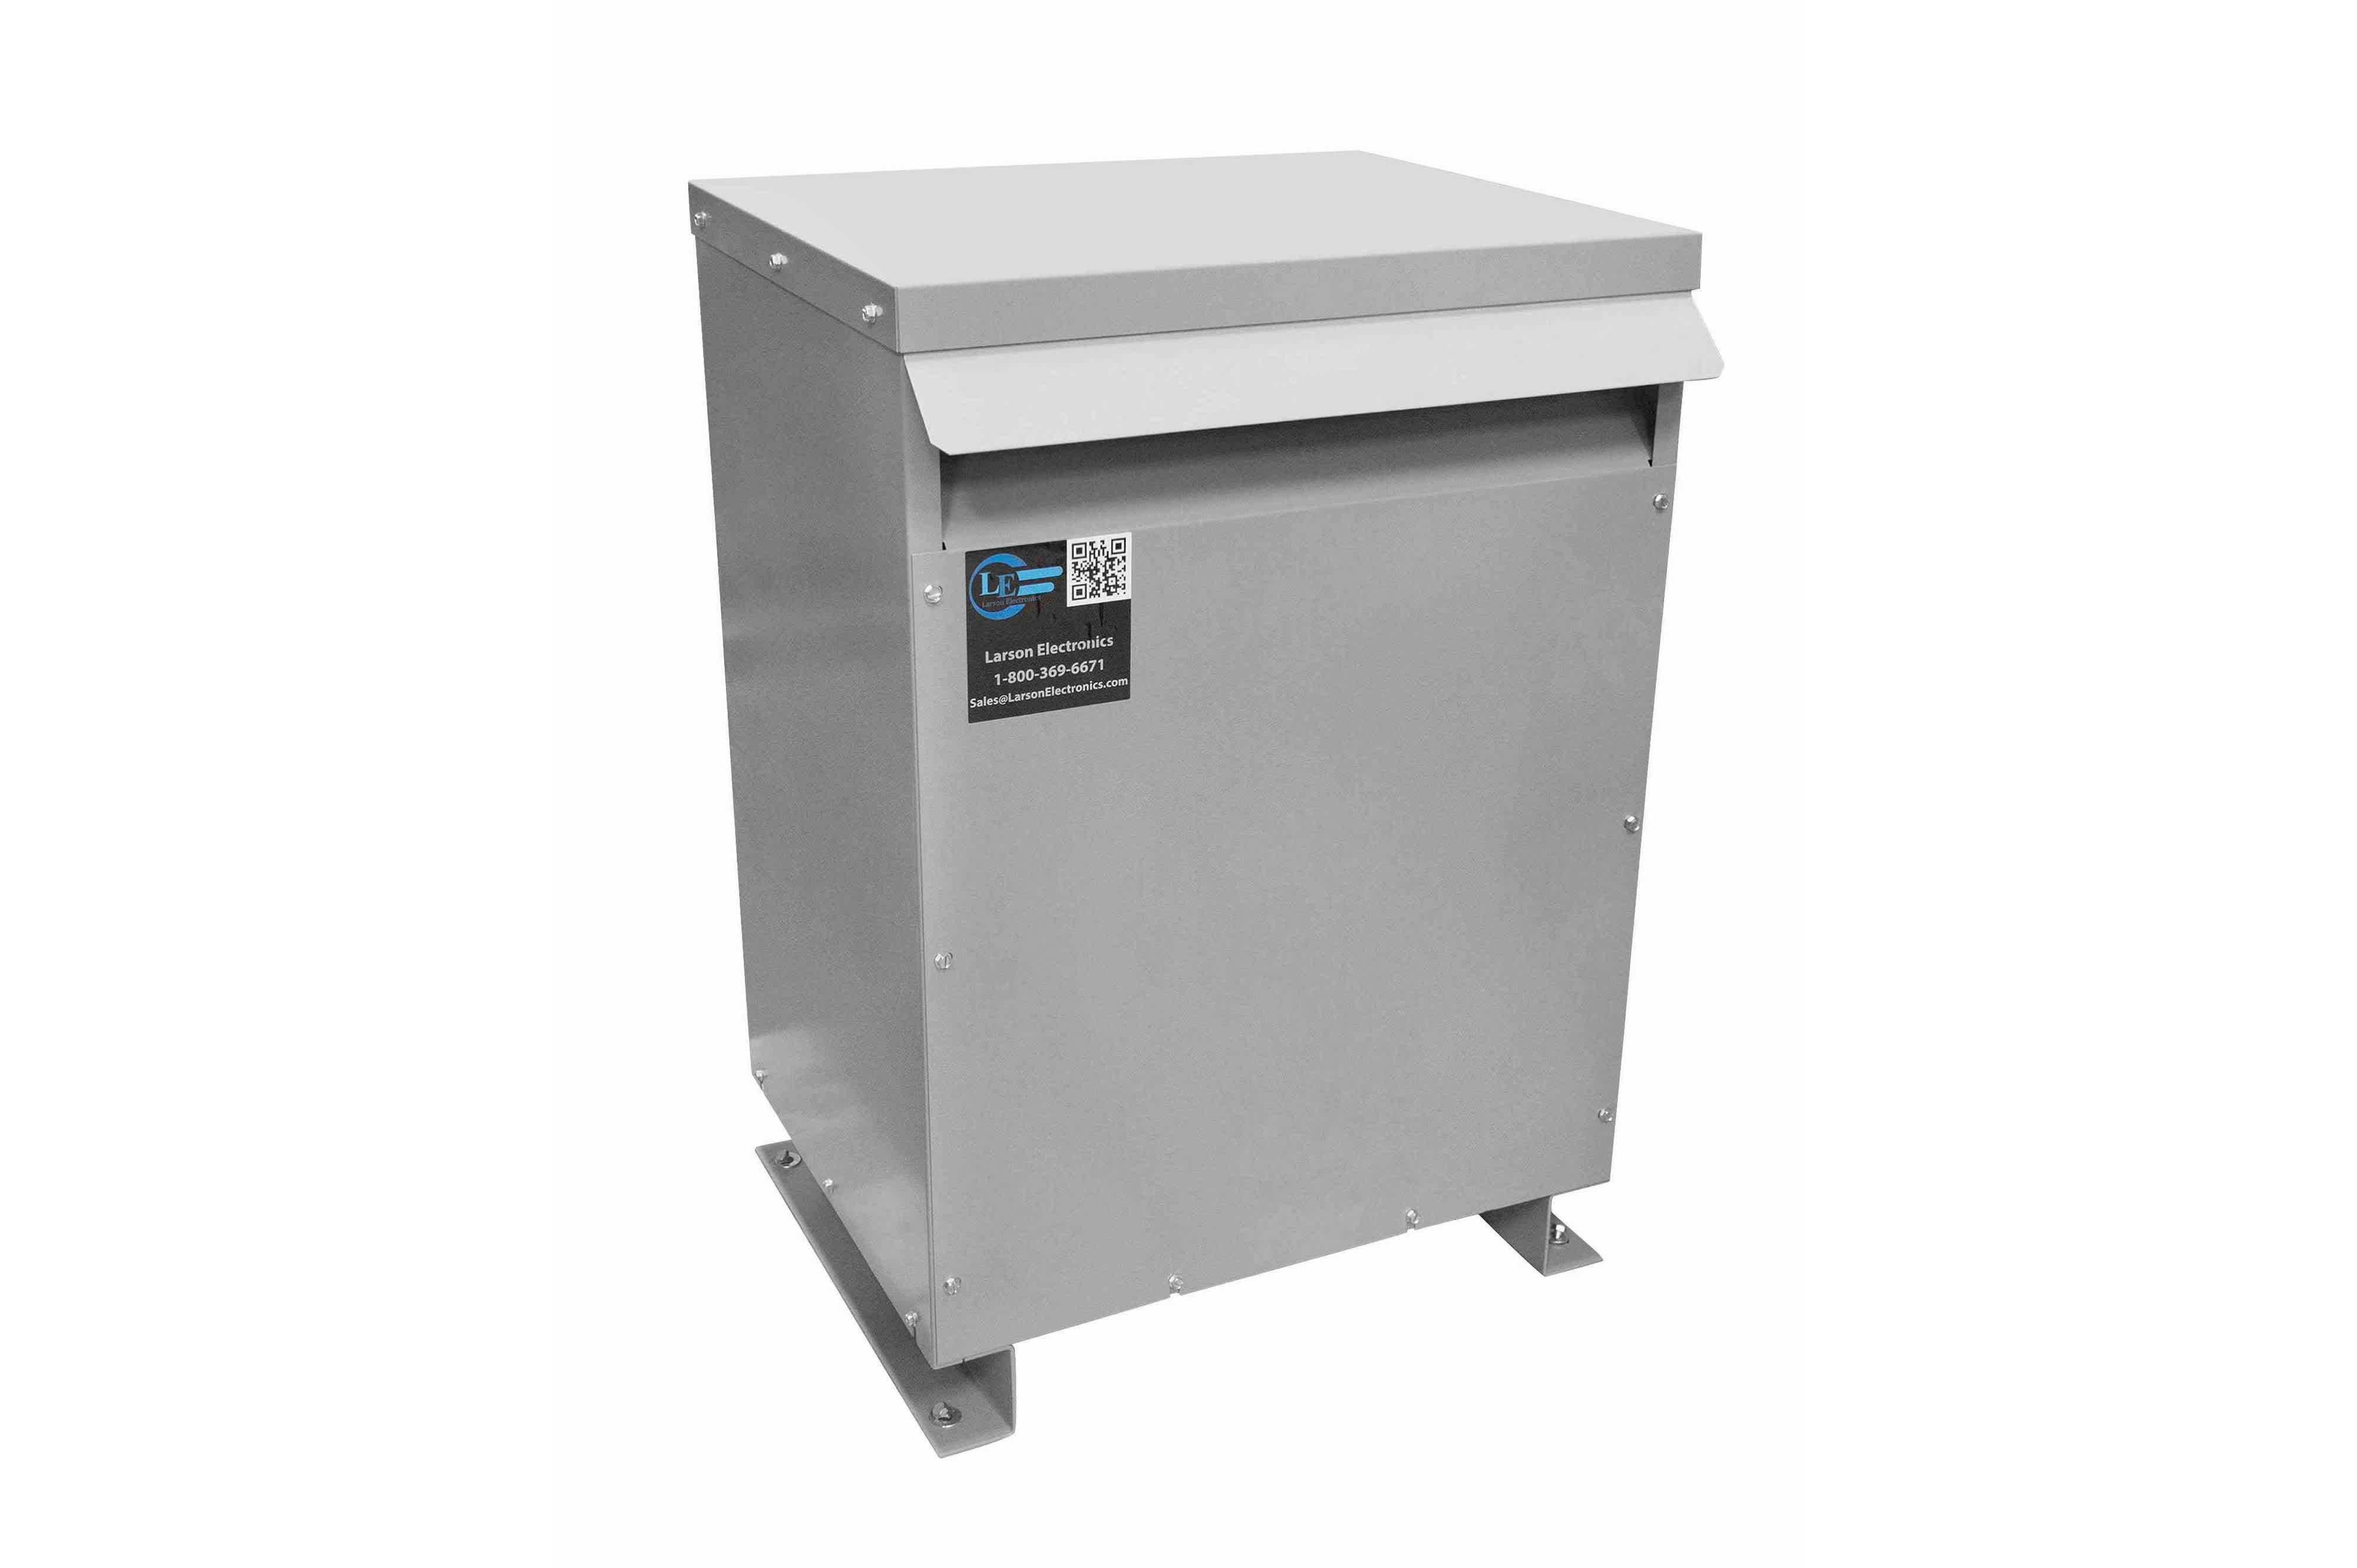 25 kVA 3PH DOE Transformer, 415V Delta Primary, 208Y/120 Wye-N Secondary, N3R, Ventilated, 60 Hz